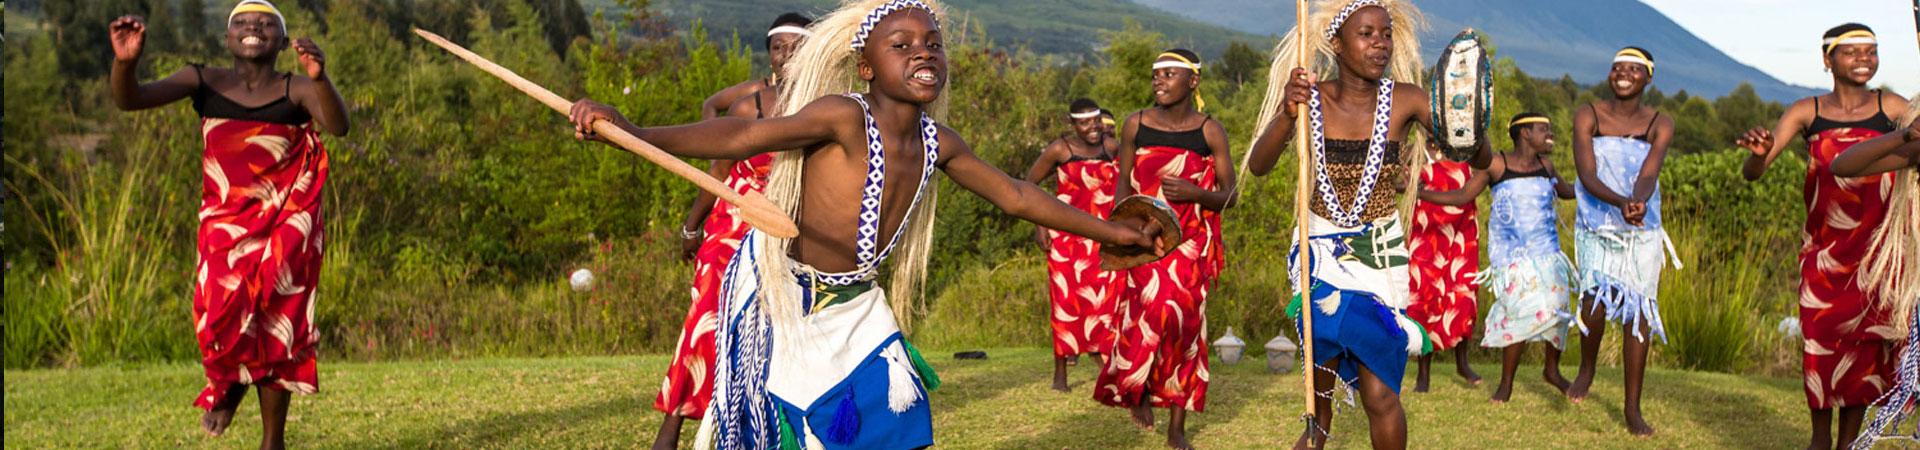 5-Days-Rwanda-Dancing-Traditionally